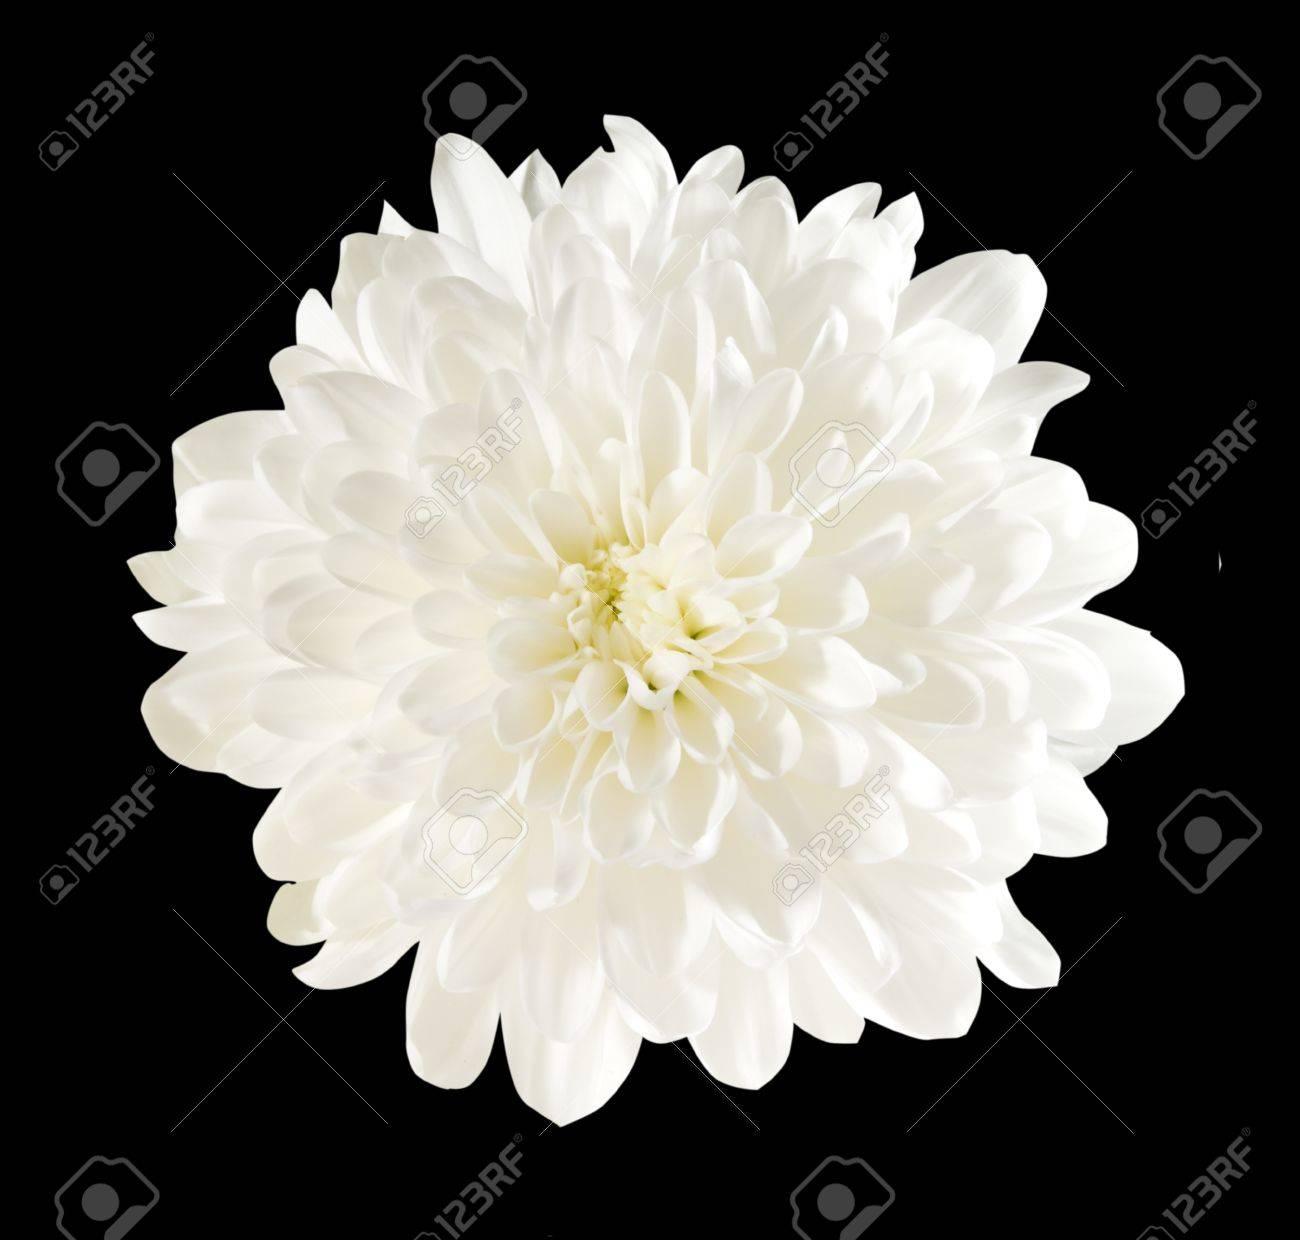 One flower white chrysanthemum on black background stock photo one flower white chrysanthemum on black background stock photo 10993182 mightylinksfo